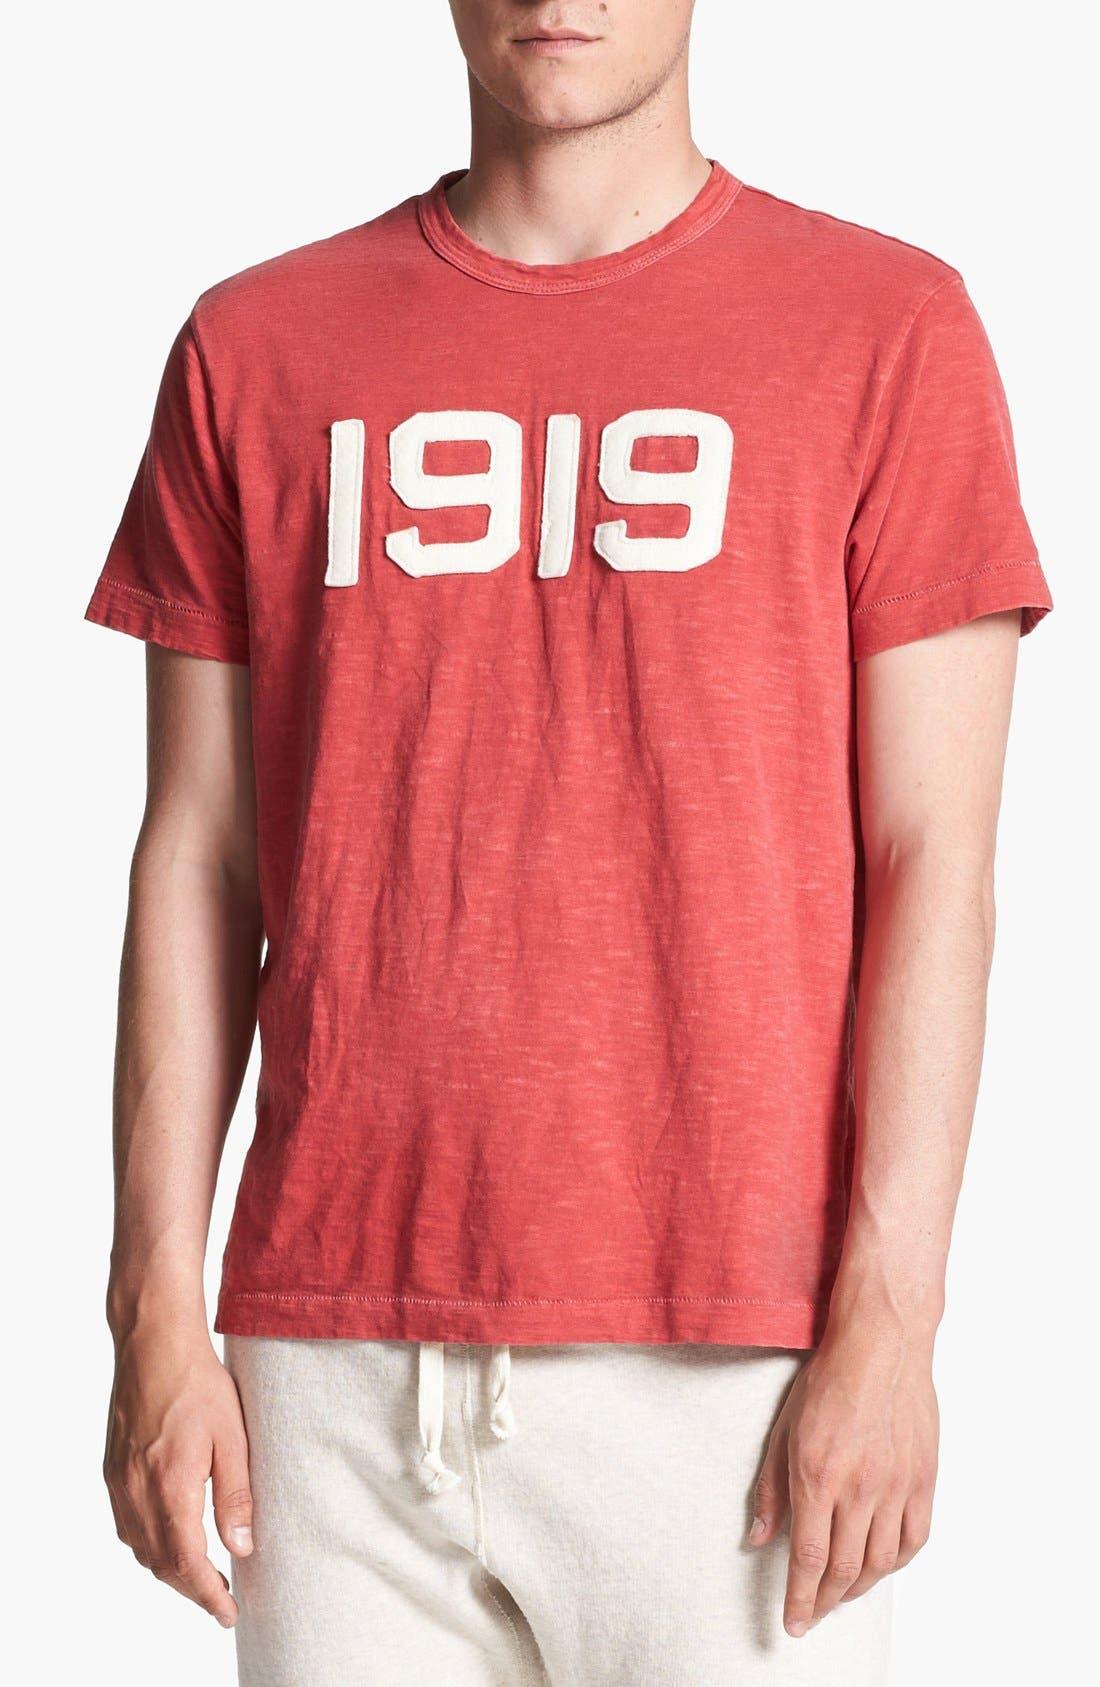 TODD SNYDER + CHAMPION, '1919' T-Shirt, Main thumbnail 1, color, 640